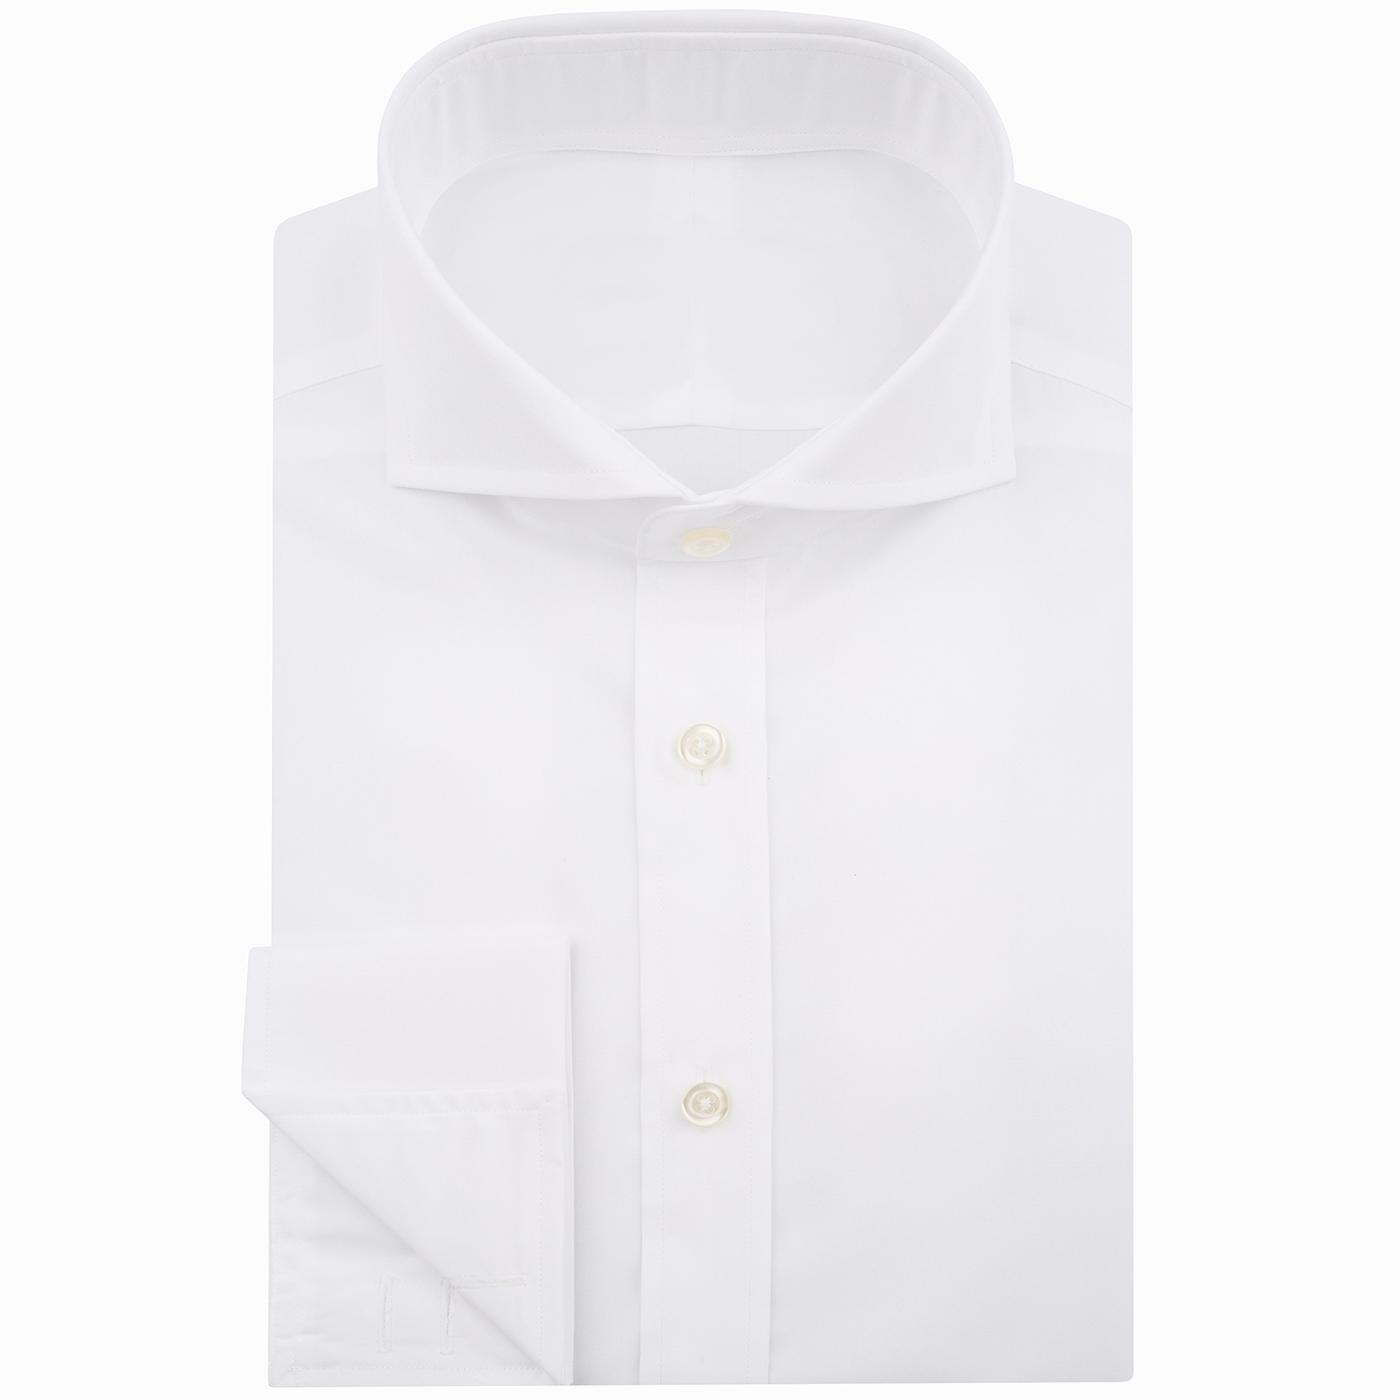 Shirt_21_Royal-twill_white.jpg